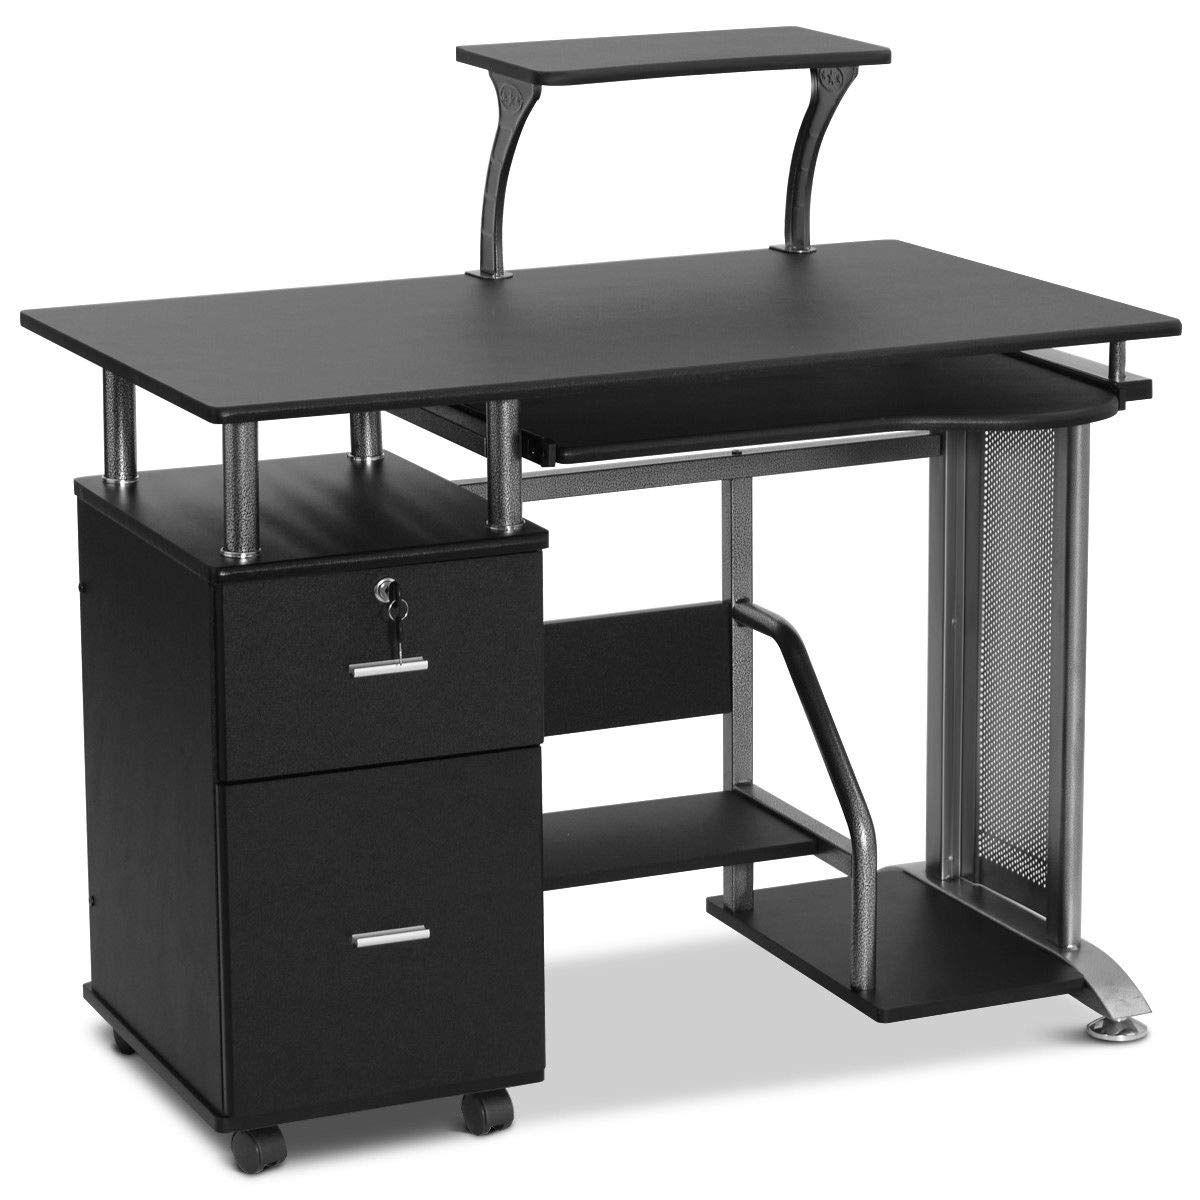 Awe Inspiring Small Computer Desk With Printer Shelf Black Computer Desk Pc Desk Printer Shelf